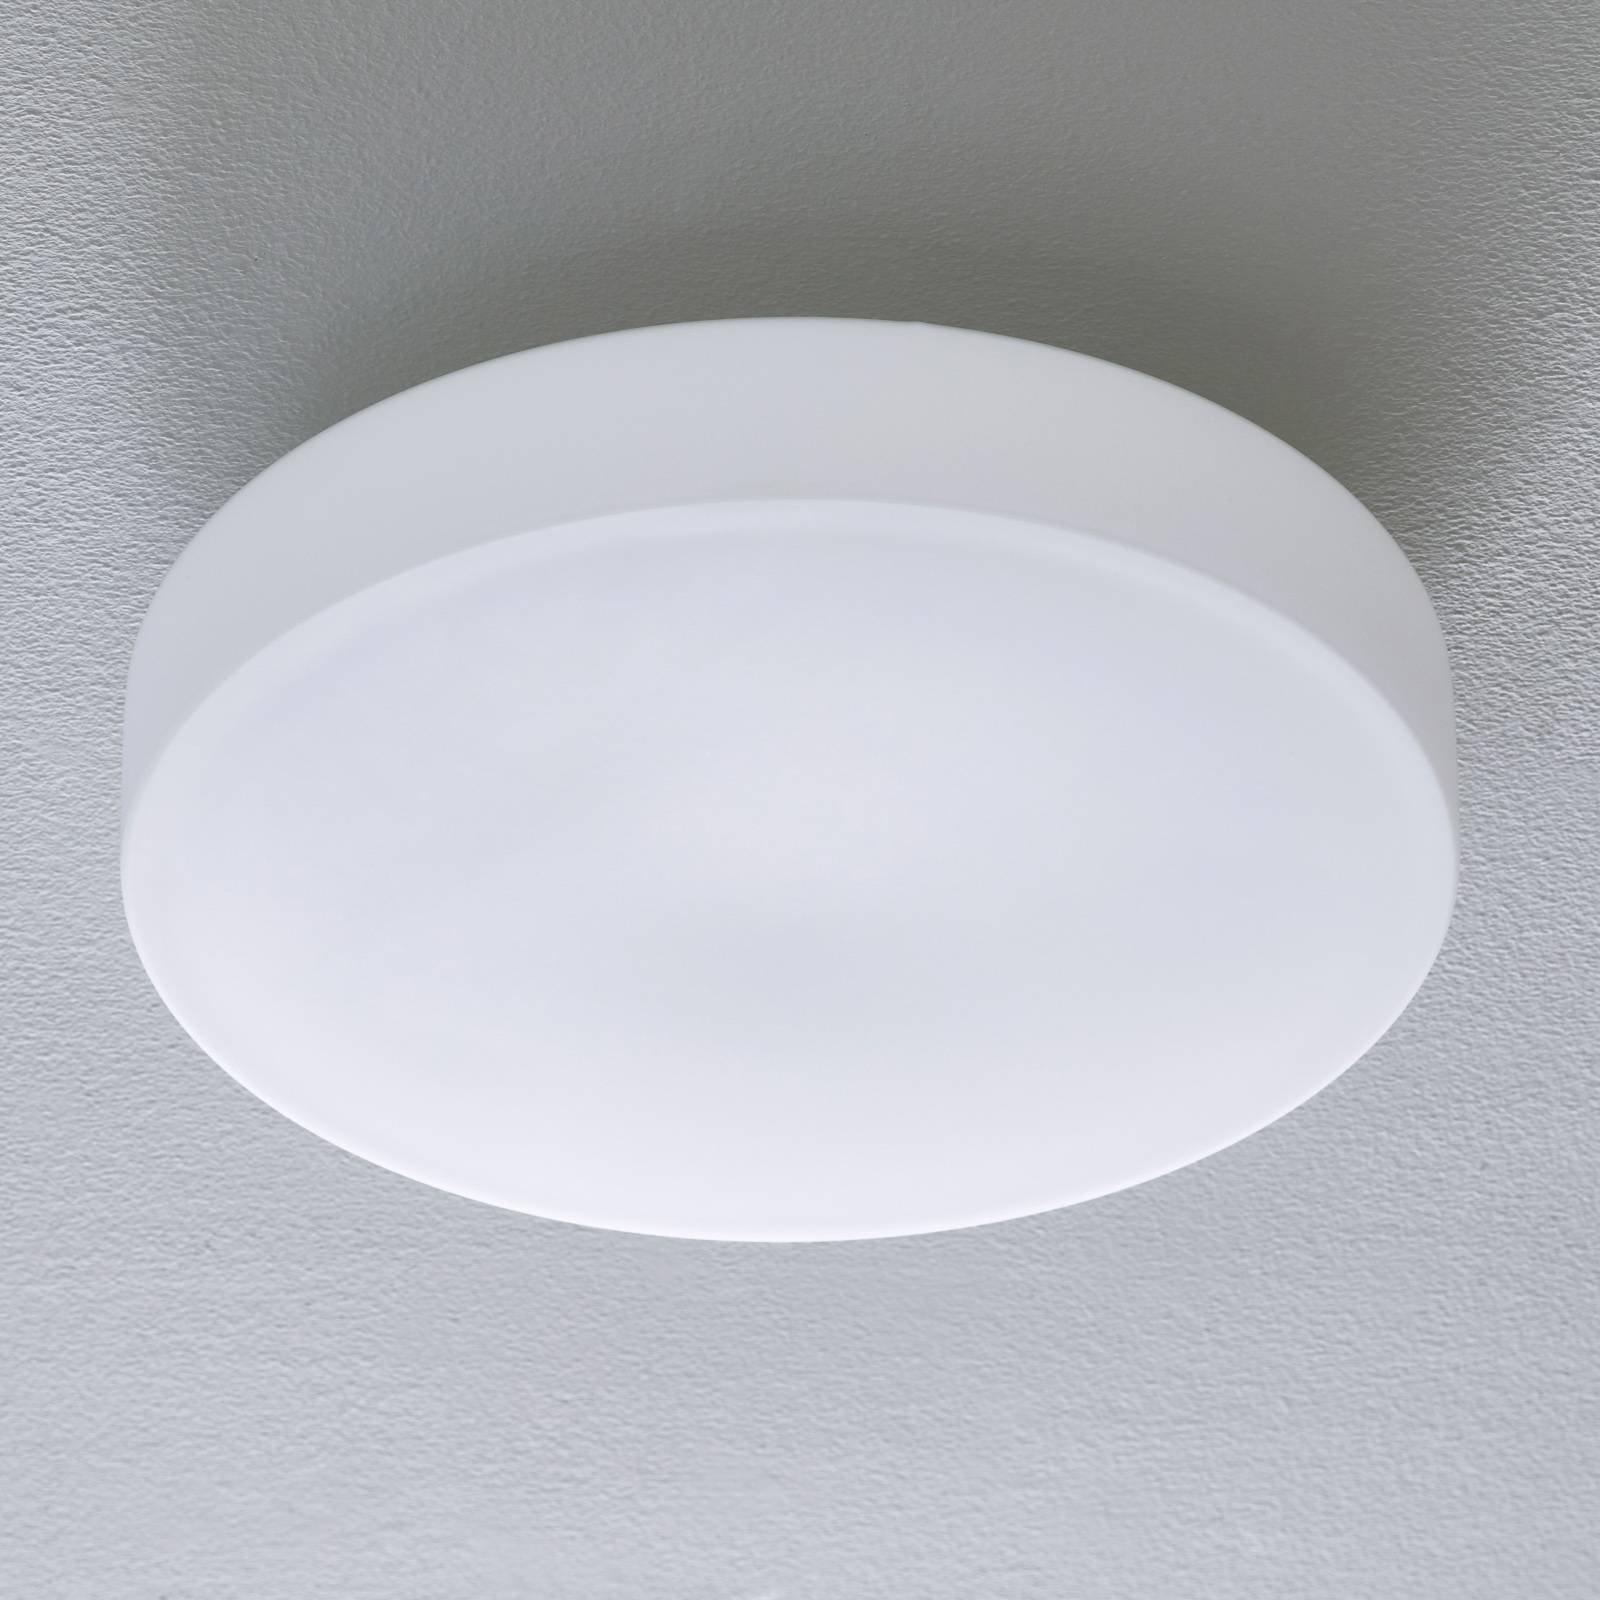 BEGA 50652 LED-taklampe opalglass 3 000 K Ø39cm